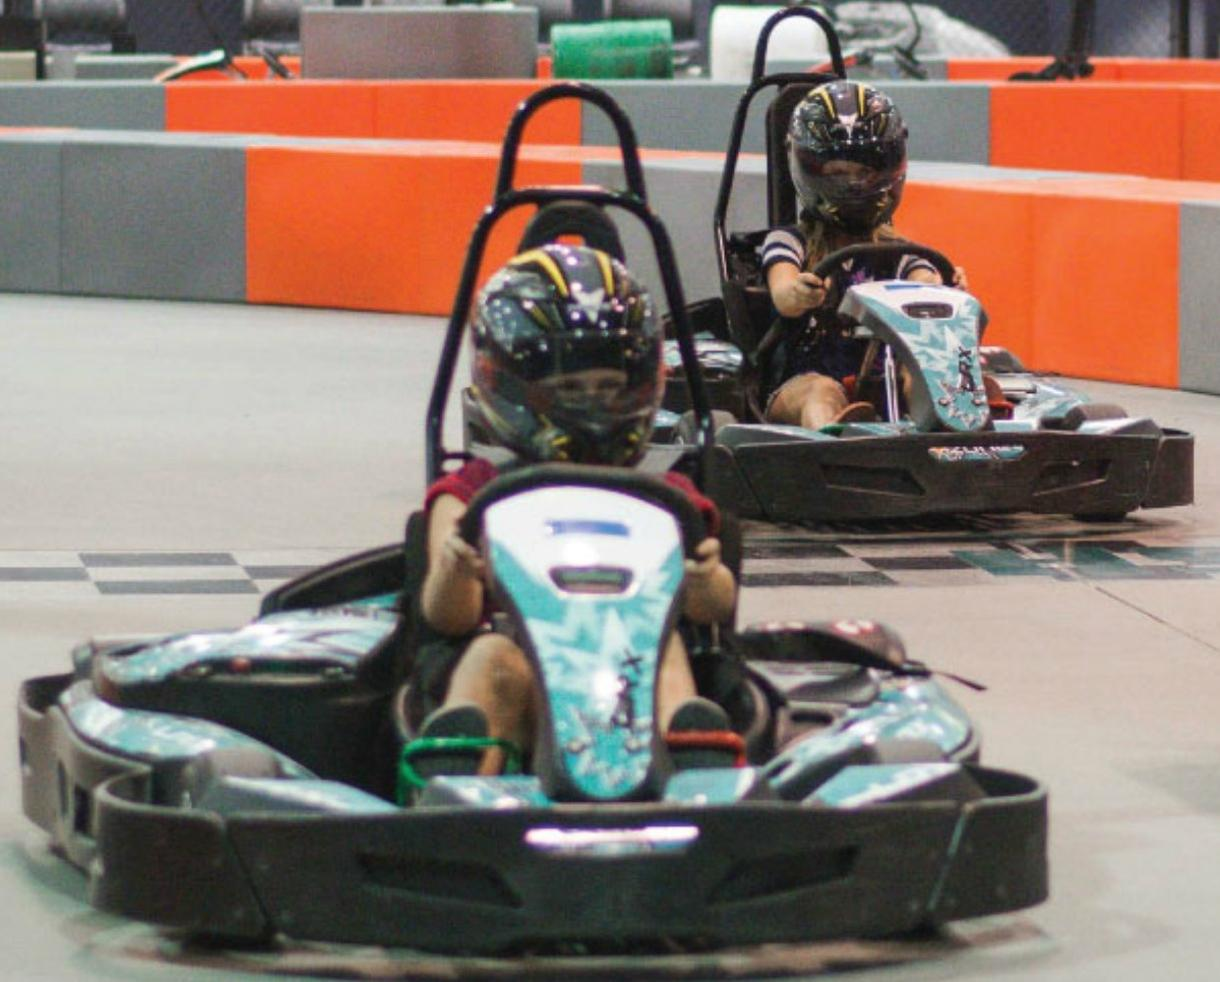 Go Karts Atlanta Ga >> Deal Nitro Zone Go Karts Ninja Course Trampoline Bazooka Ball More Certifikid